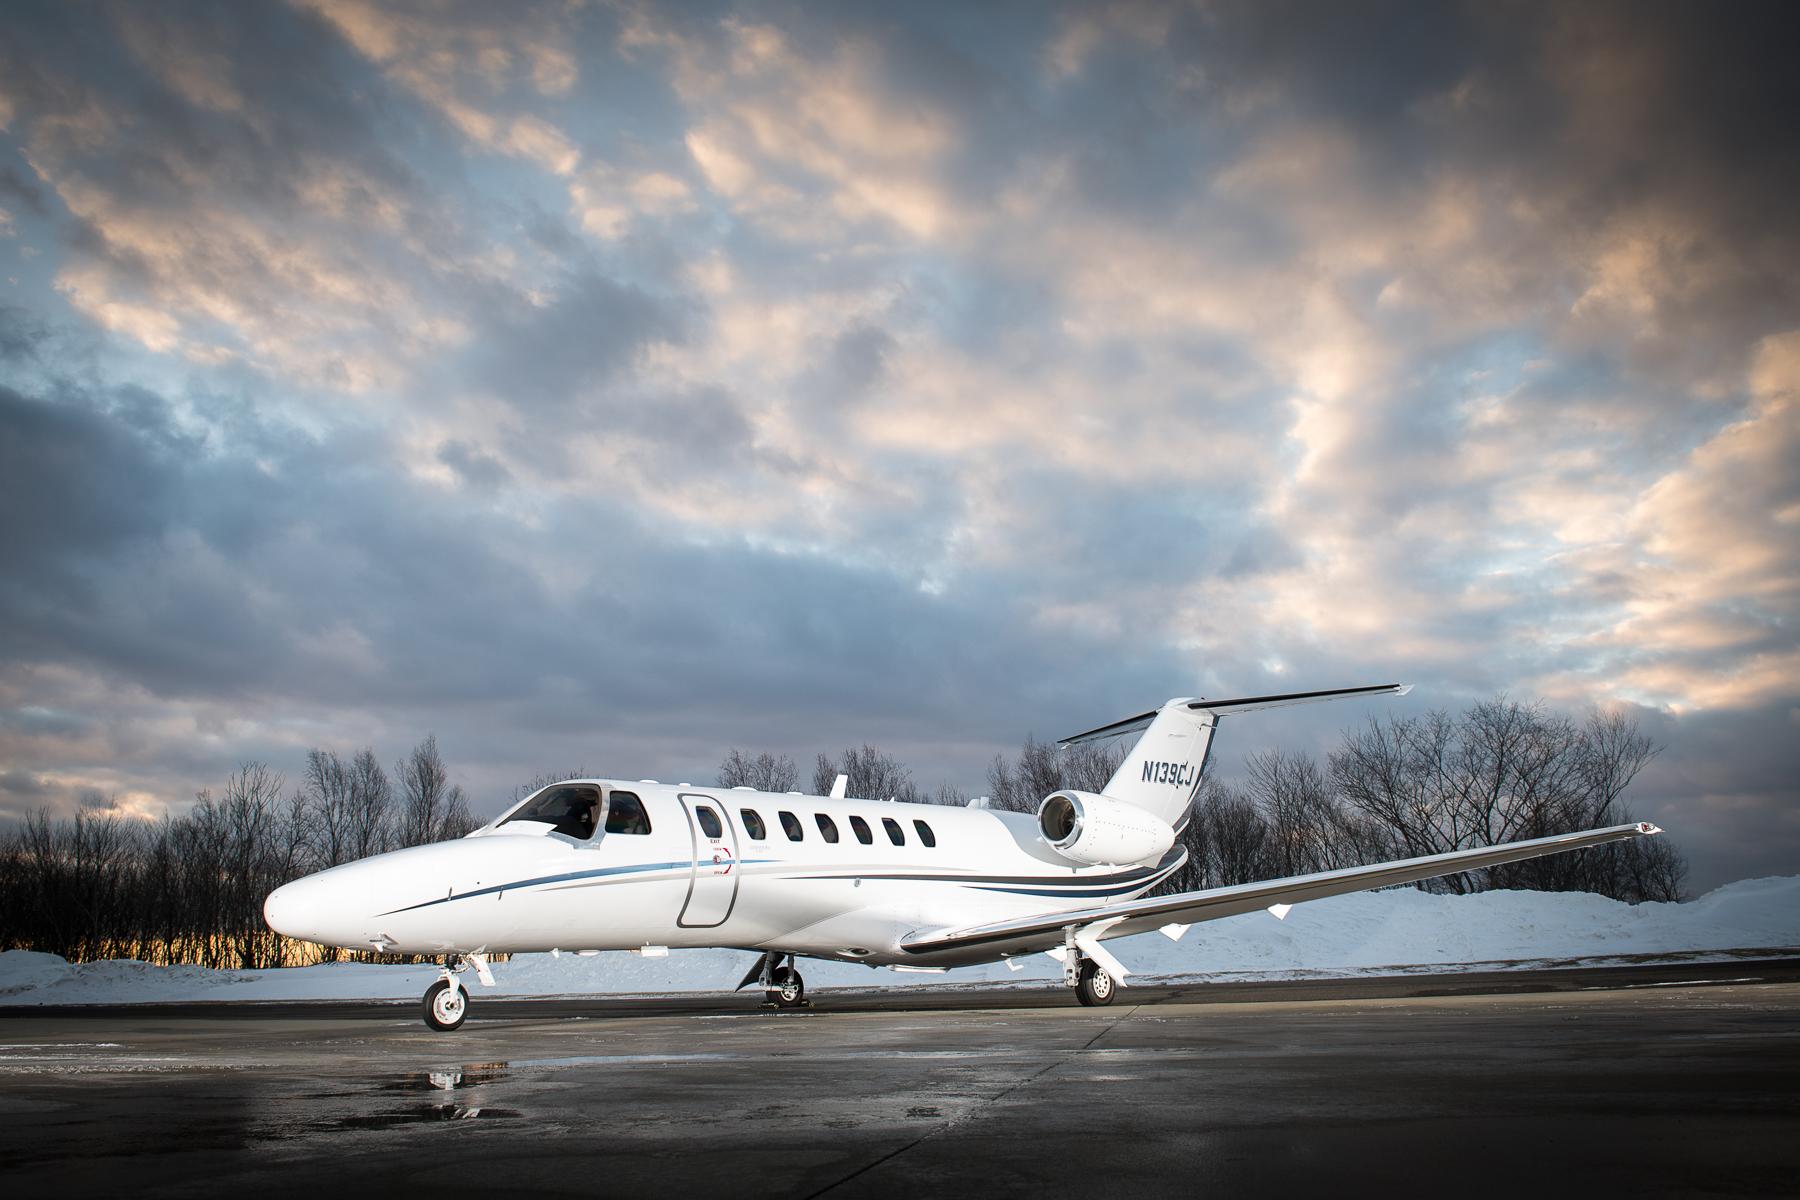 Citation_CJ3_Exterior_Light-Jet_Legacy_Aviation_Private_Jet_NetJets_jet_charter_TEB_VNY_MIA_PBI_FRG_SFO_FLL_FXE_BED